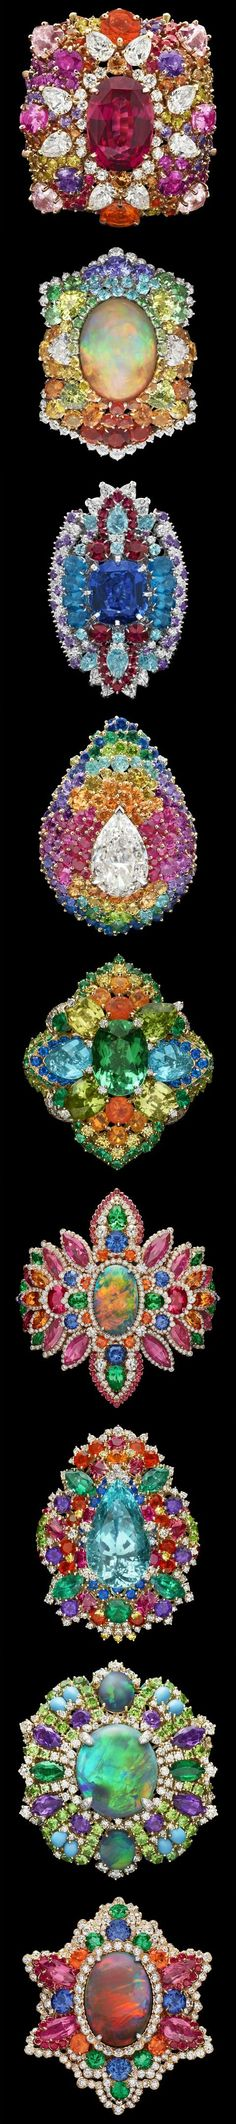 Rosamaria G Frangini | My Colorful Jewellery | TJS | Dior Rings